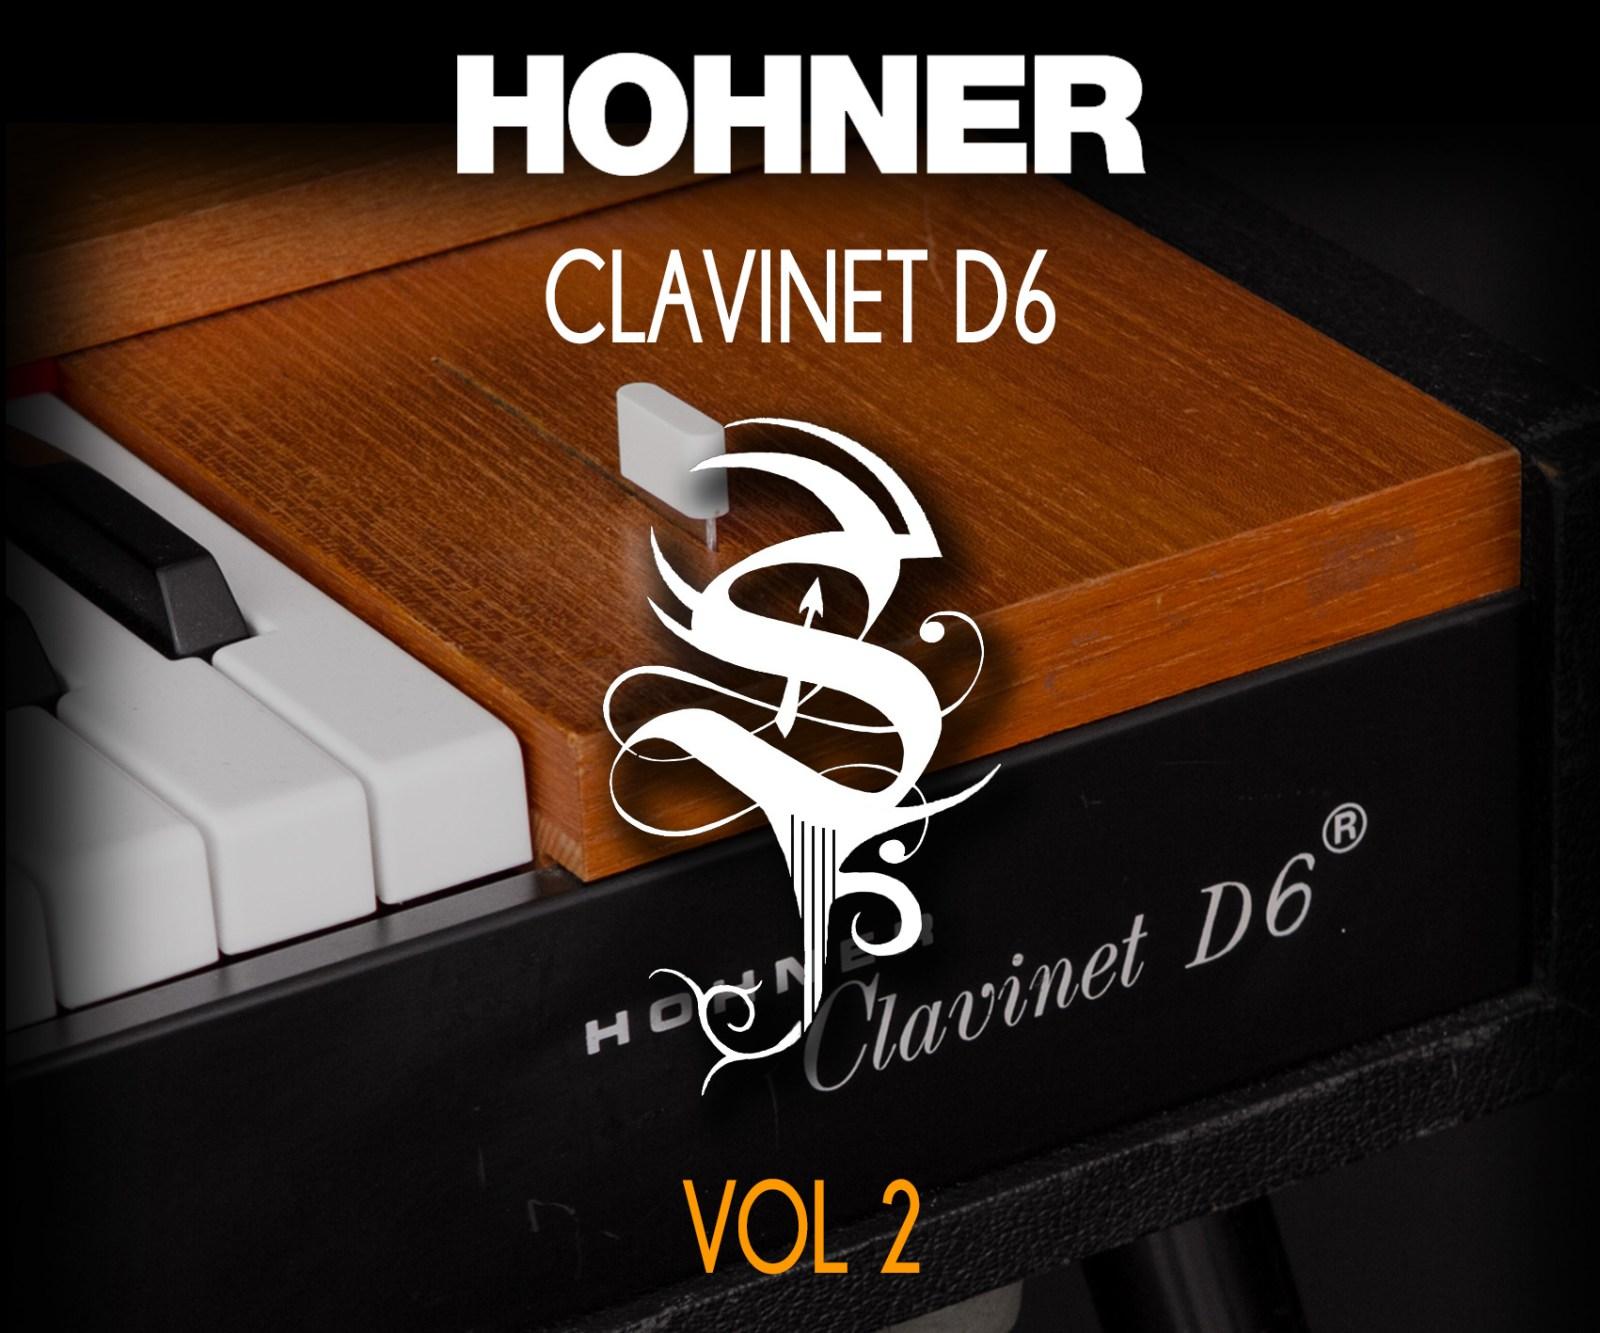 Clavinet Vol 2